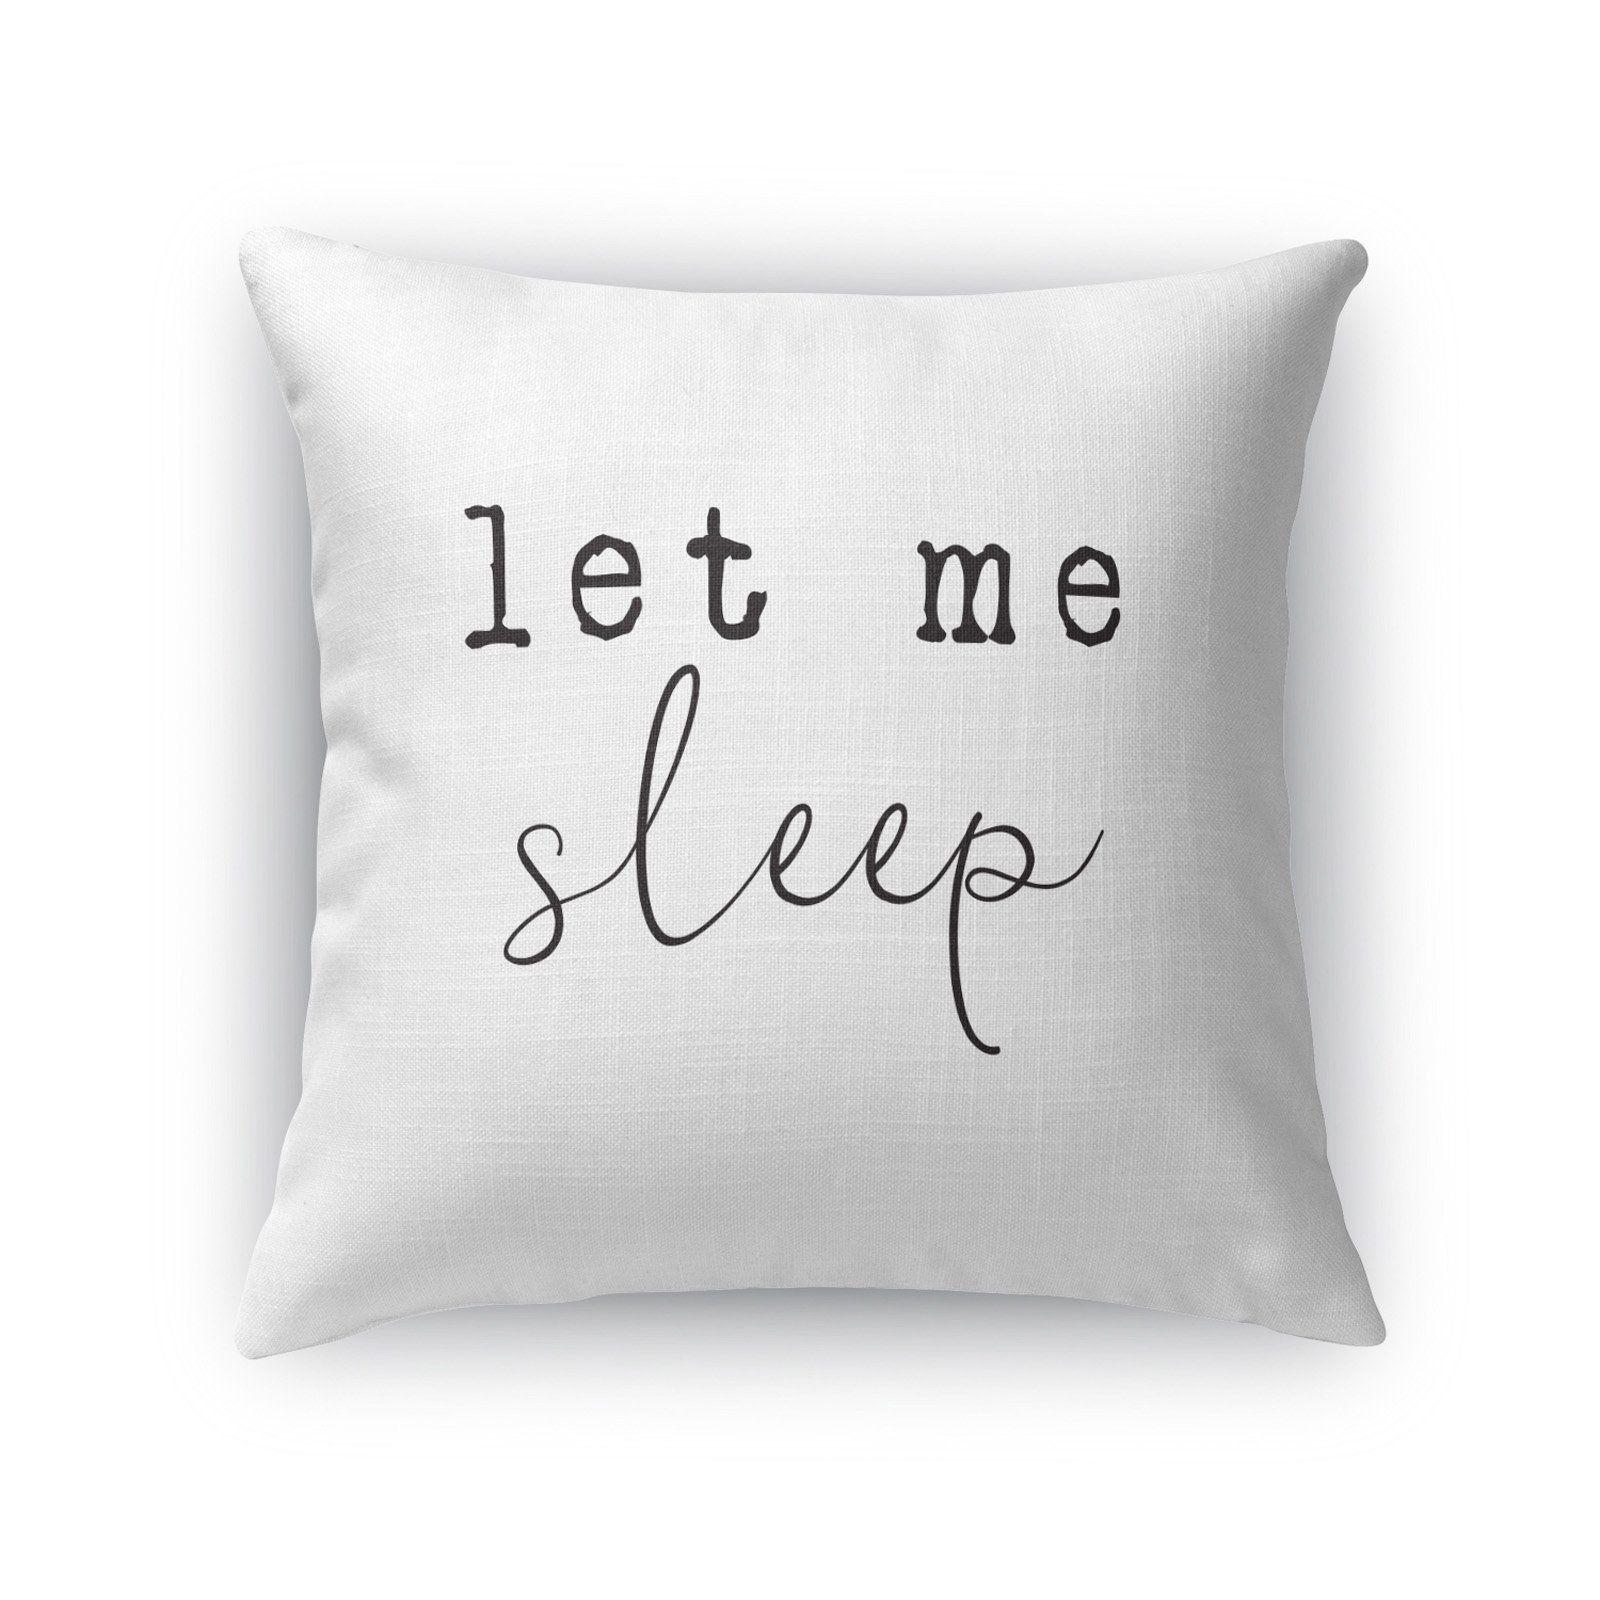 Kavka Designs Let Me Sleep Decorative Pillow by Terri Ellis